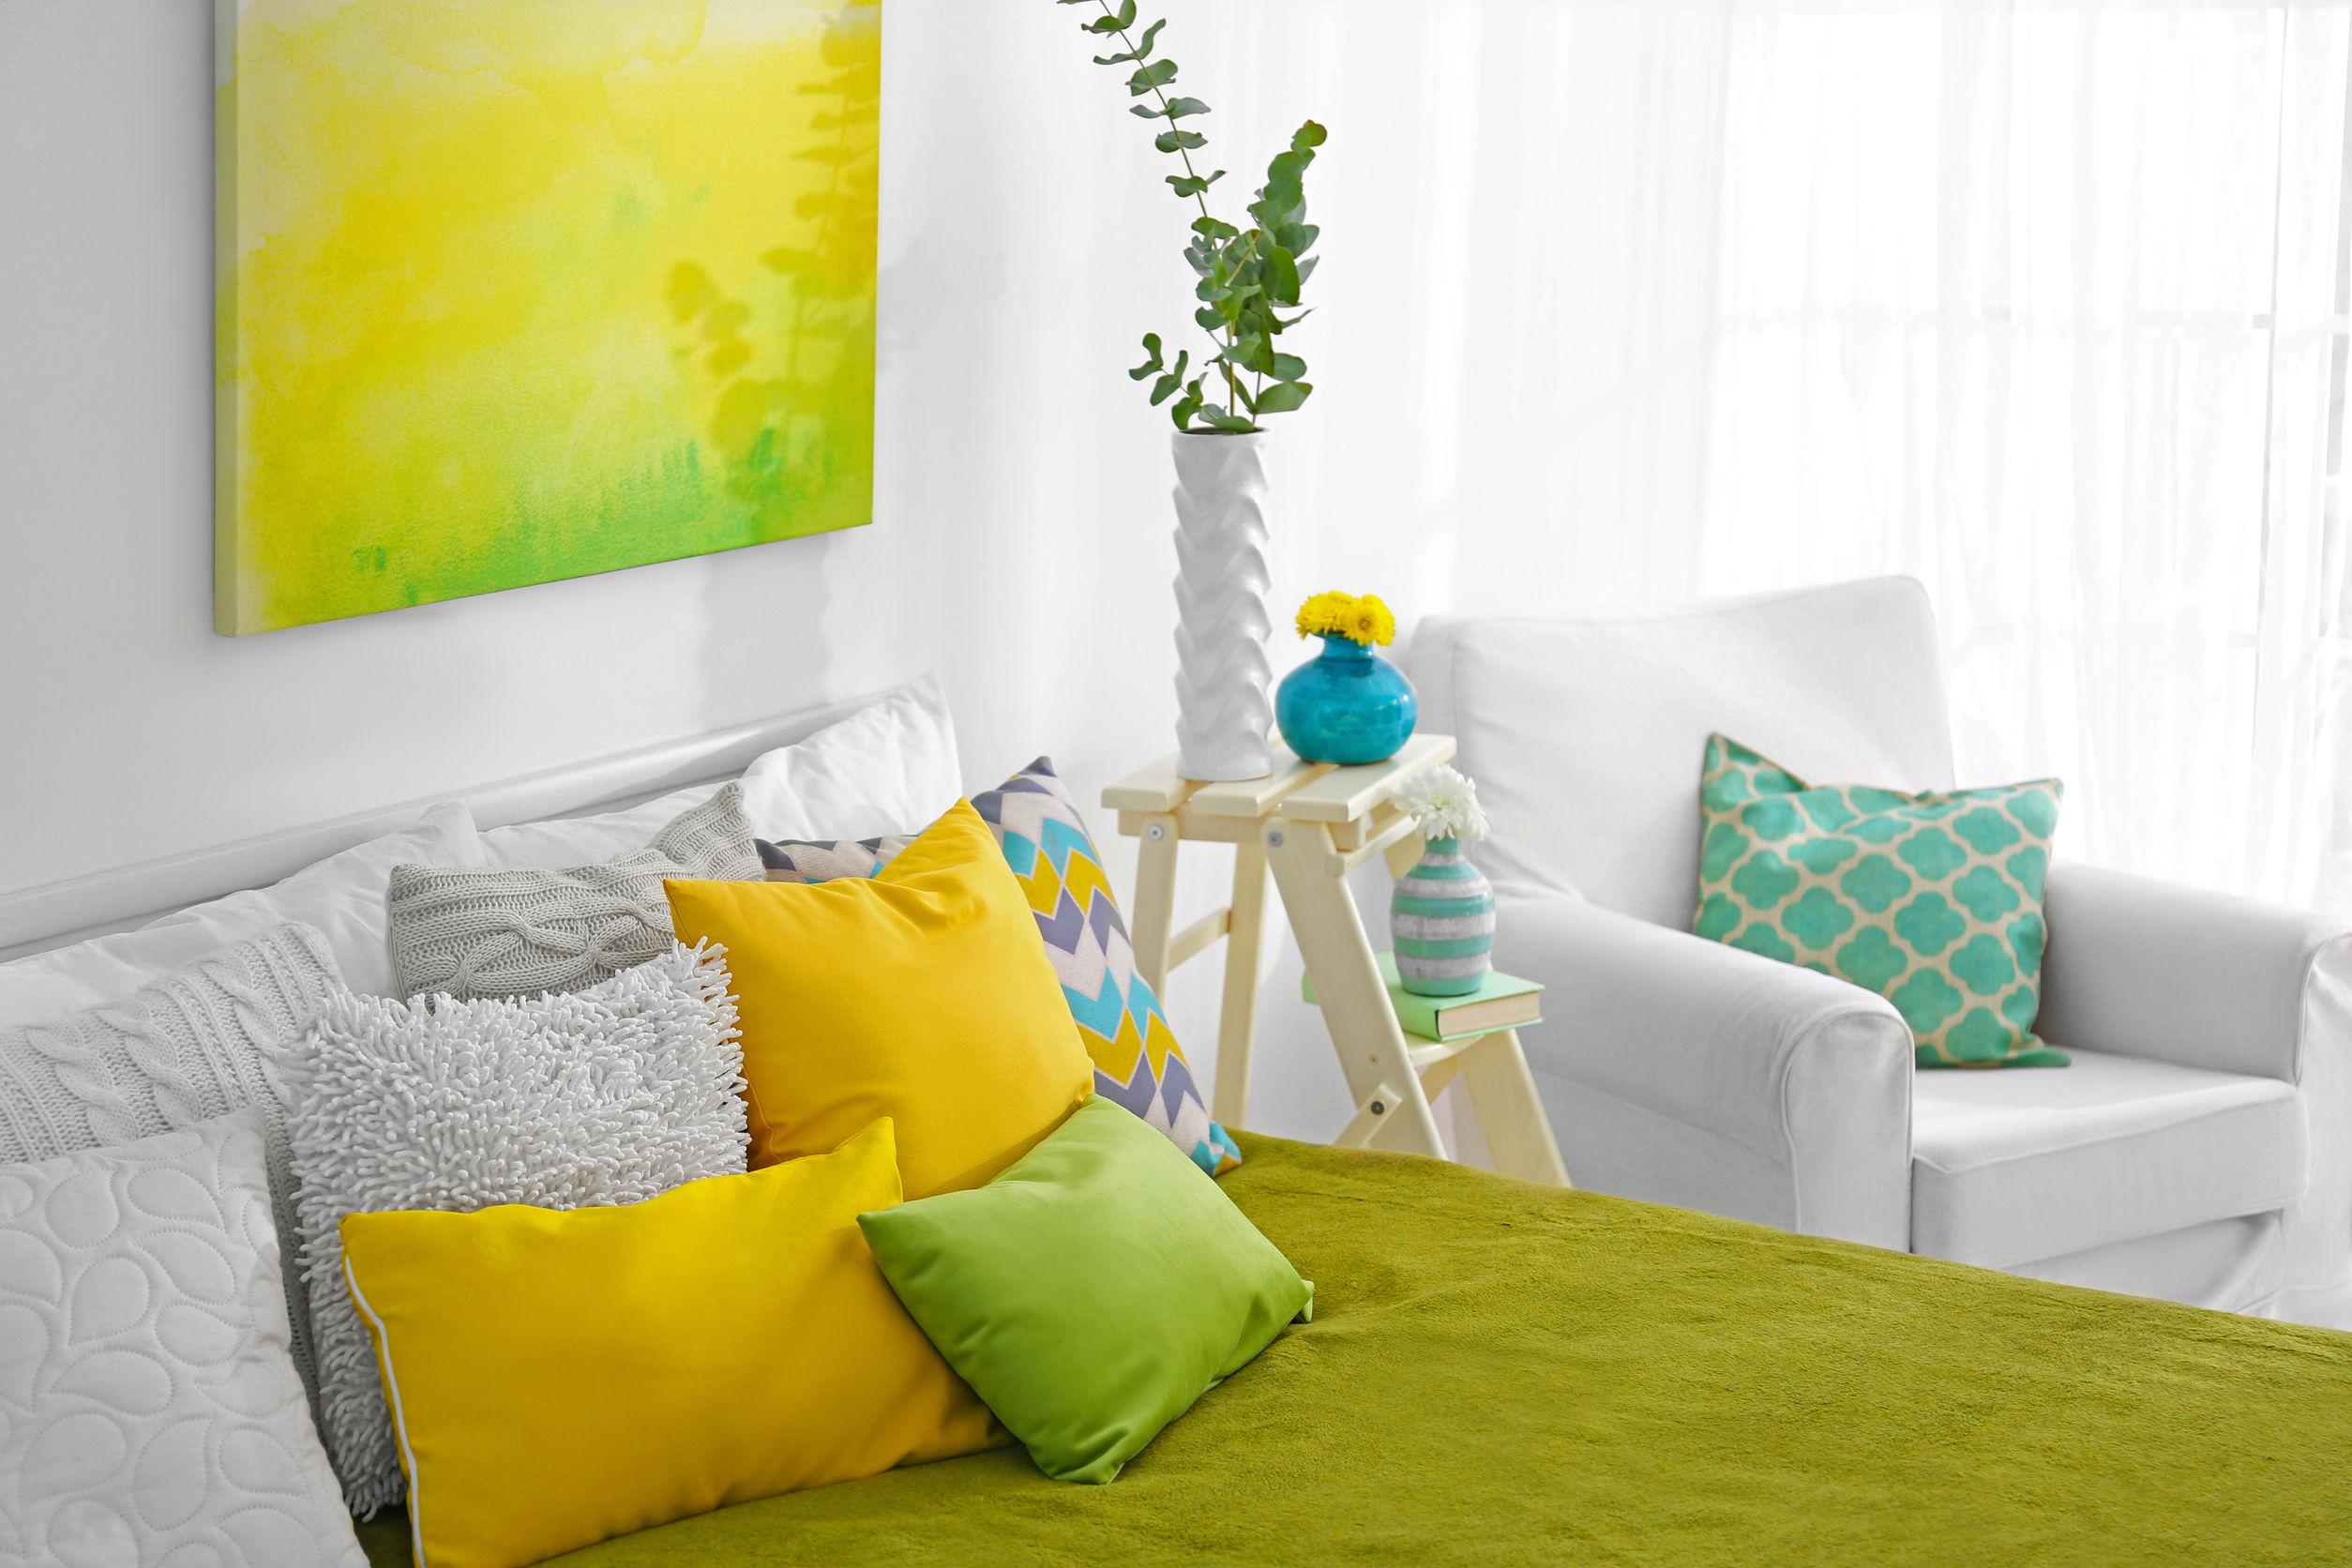 almohadas de colores